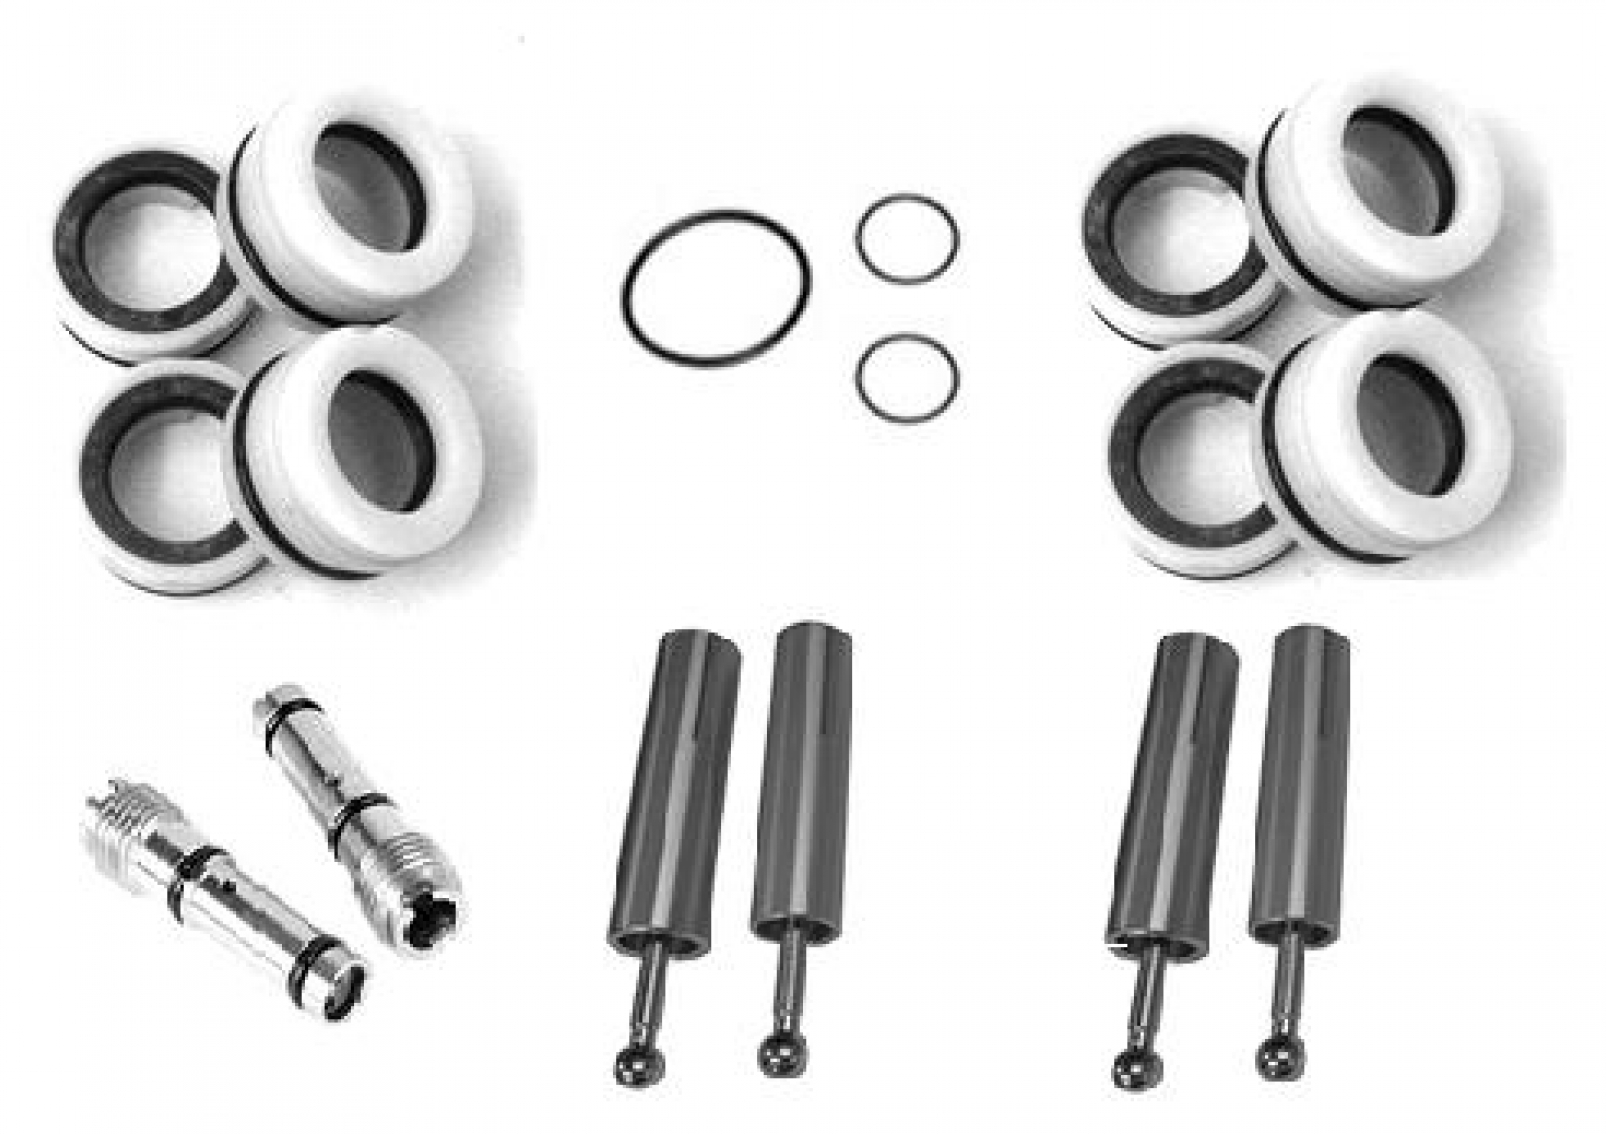 Gear Lever Actuator Repair Kit,  000 260 61 98, 000 260 79 98 (with Pentosin)